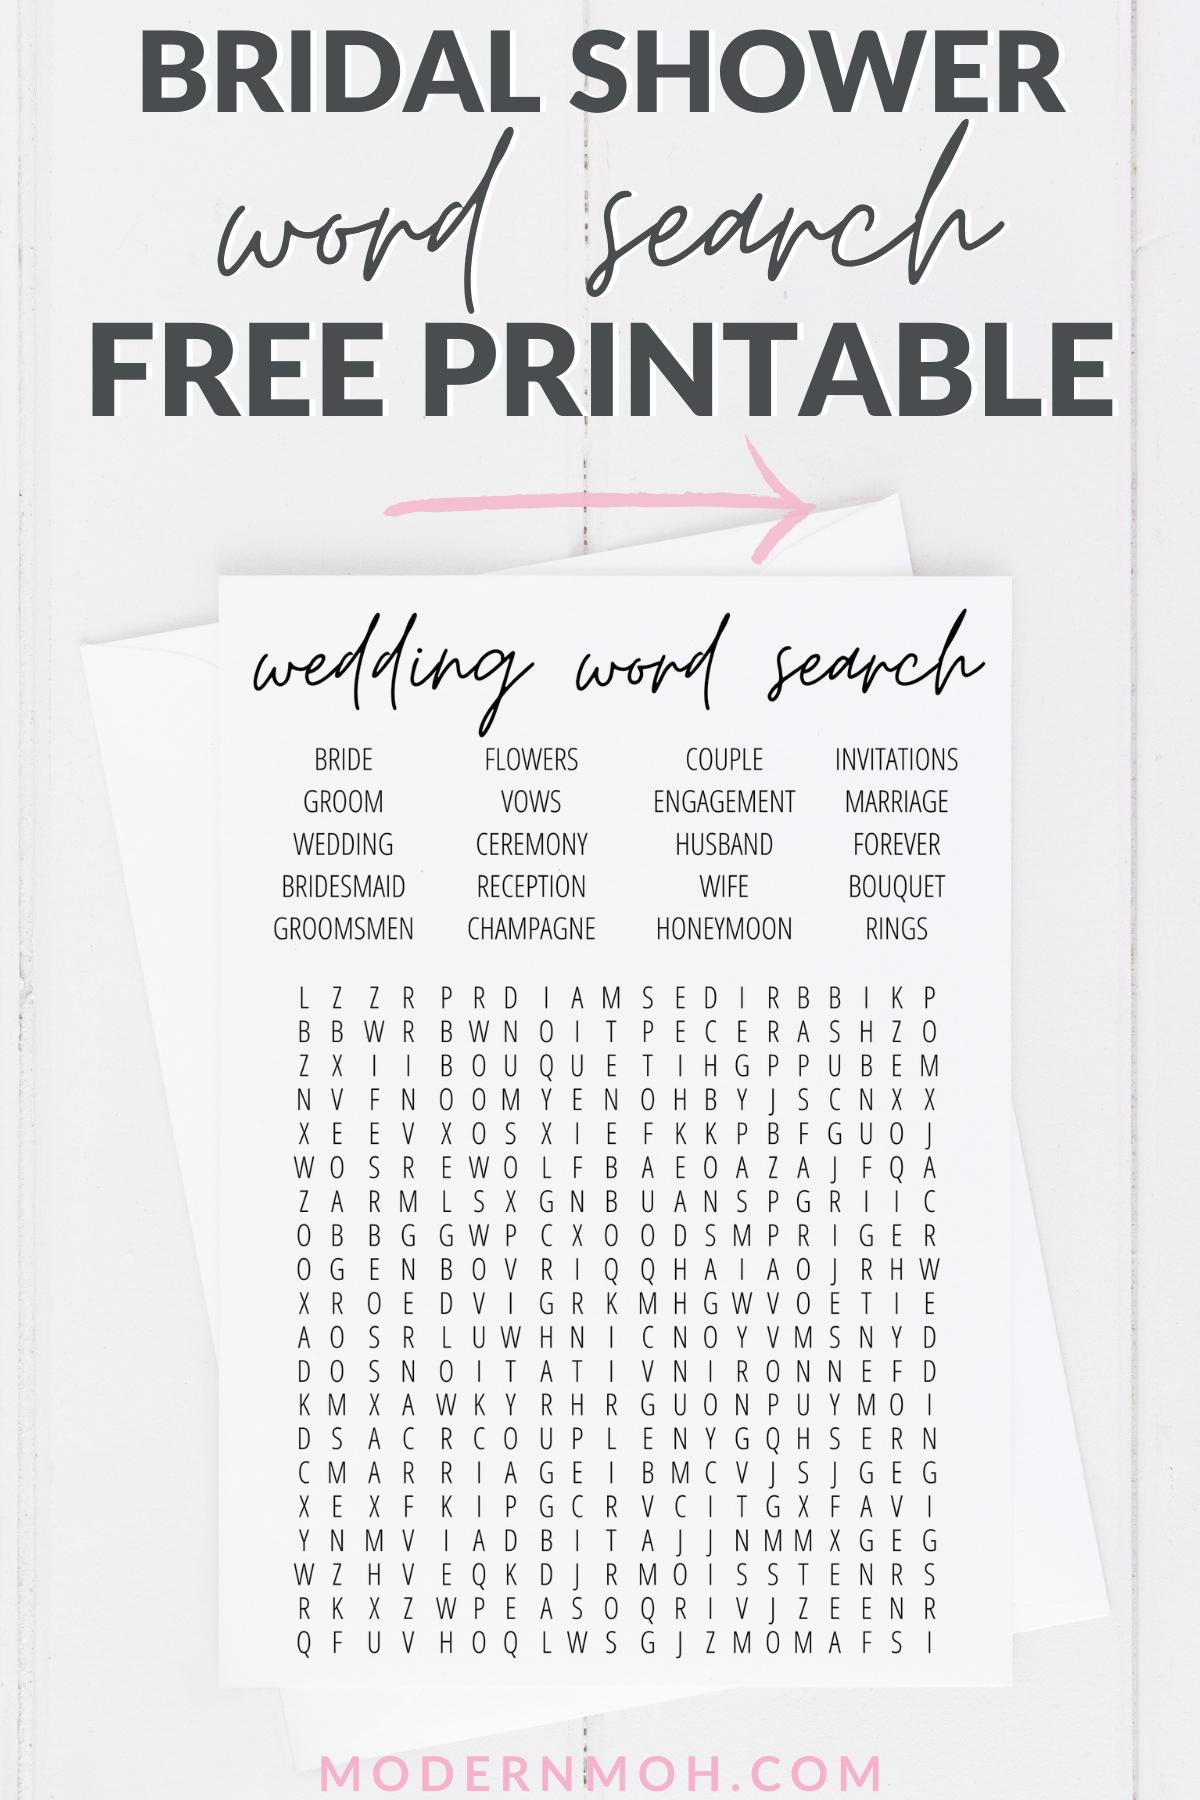 Bridal Shower Word Search Free Printable Bridal shower